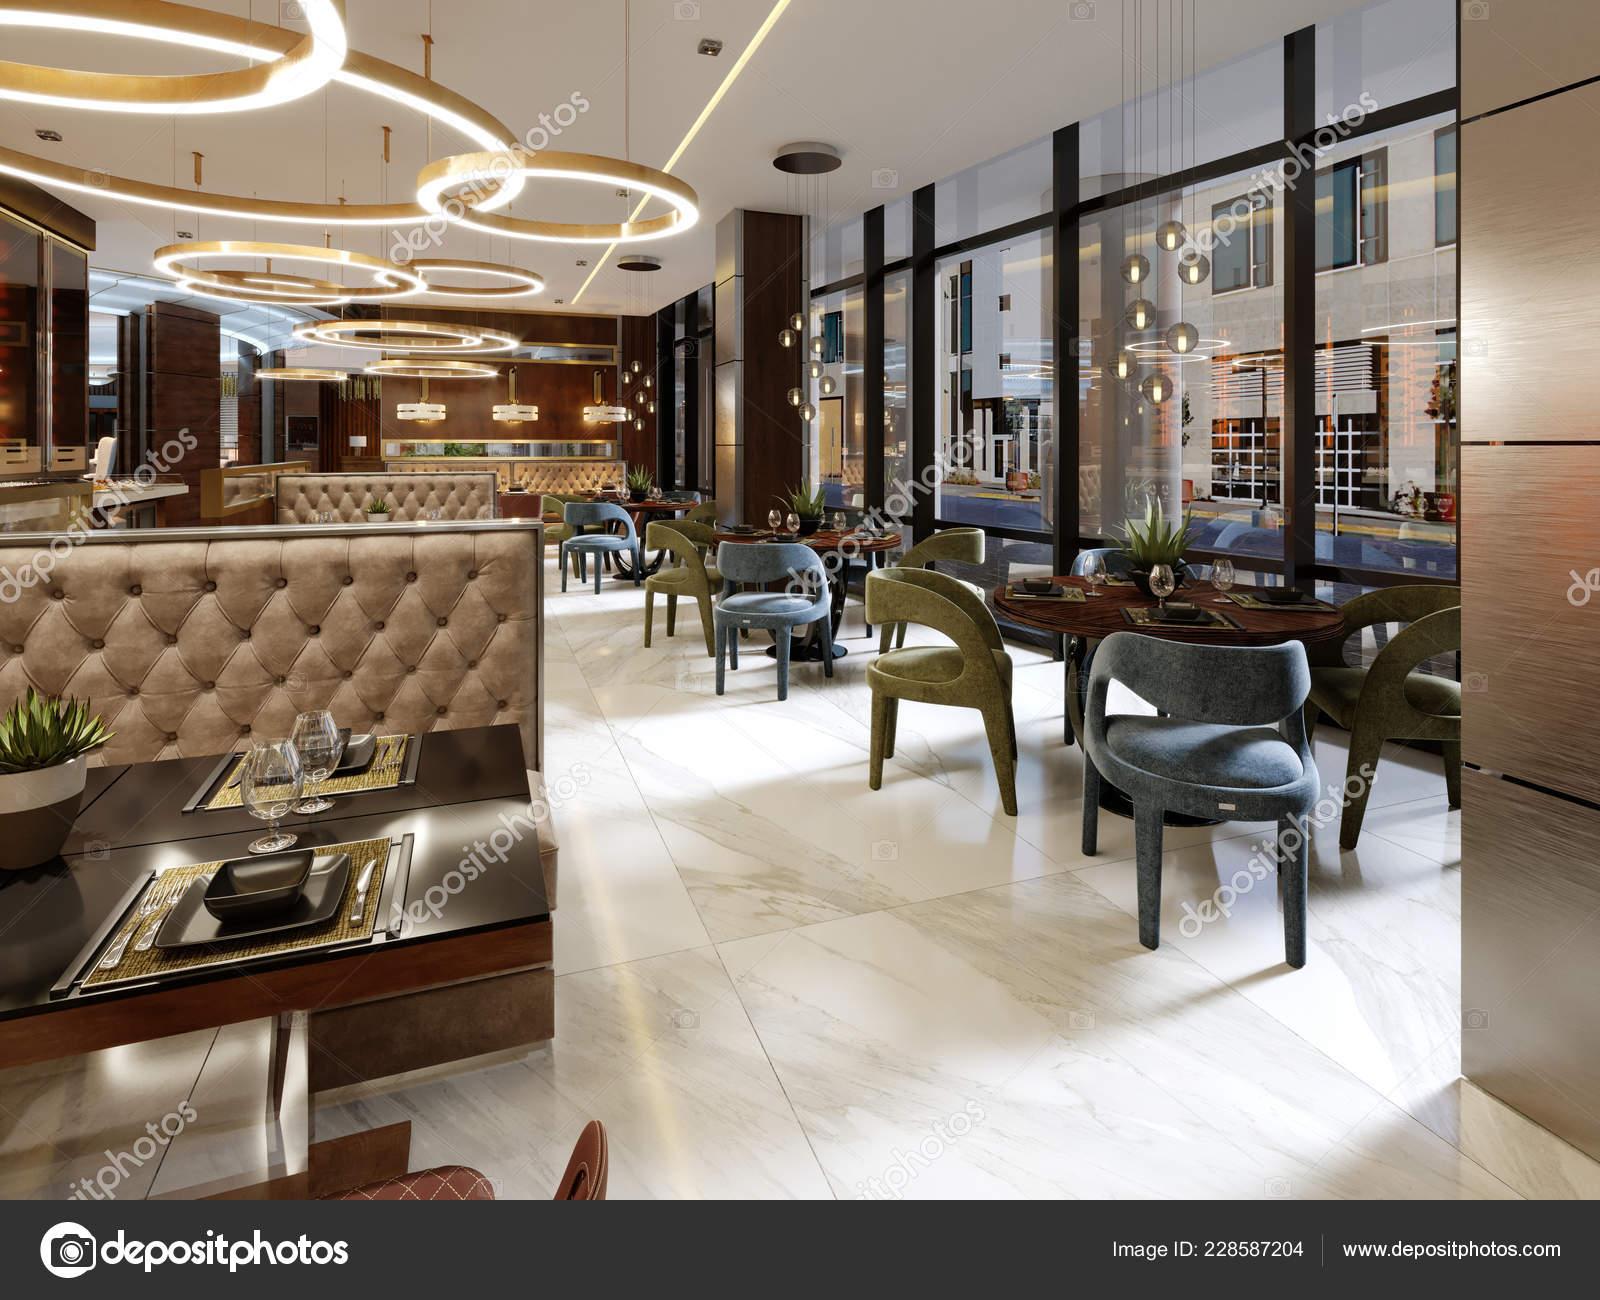 Modern Conceptual Interior Design Restaurant Contemporary Style Classic Elements Rendering Stock Photo C Kuprin33 228587204